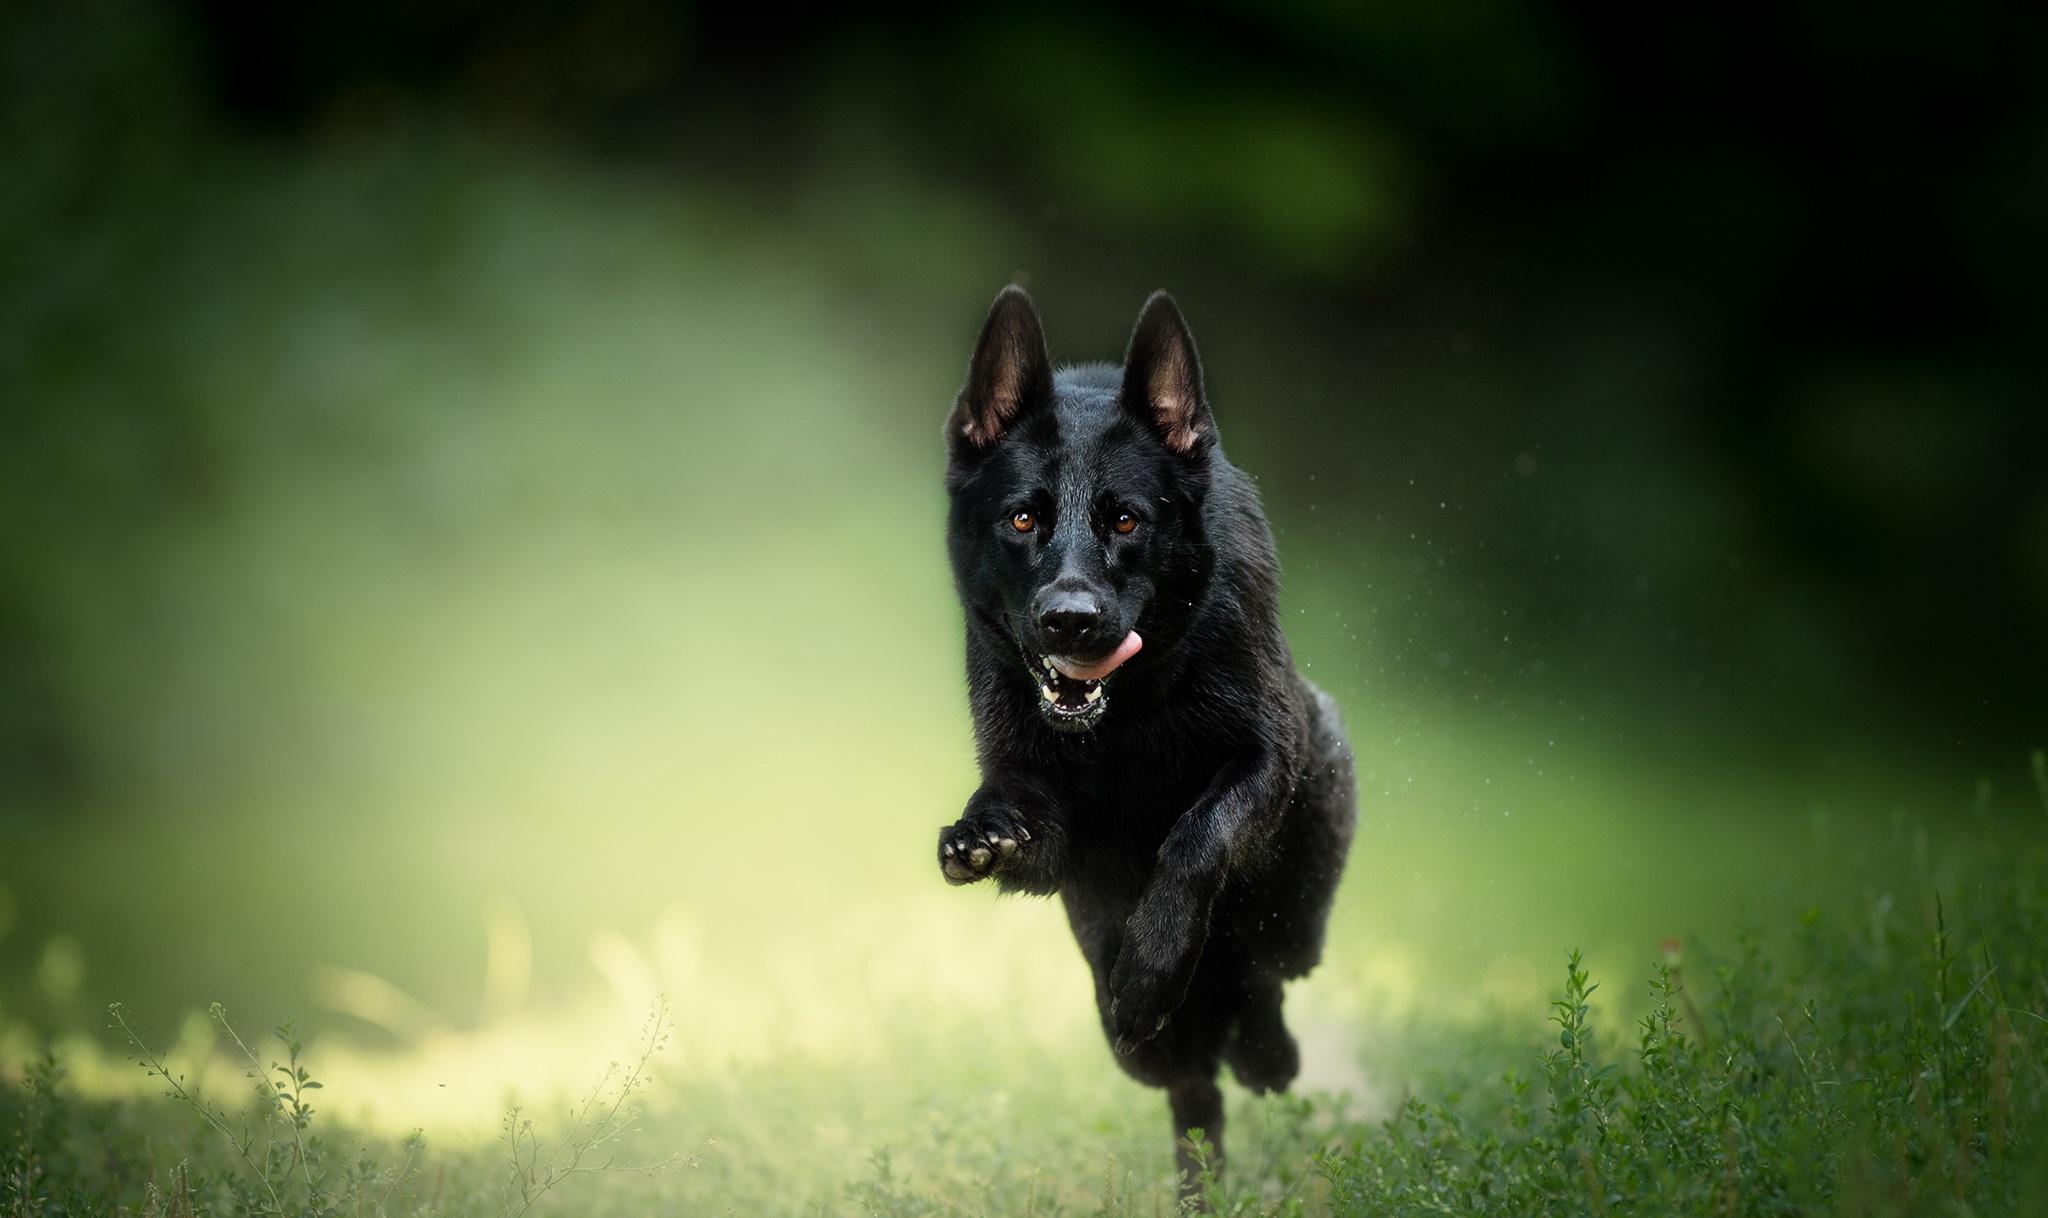 Dog Pet Depth Of Field Sunny 2048x1218